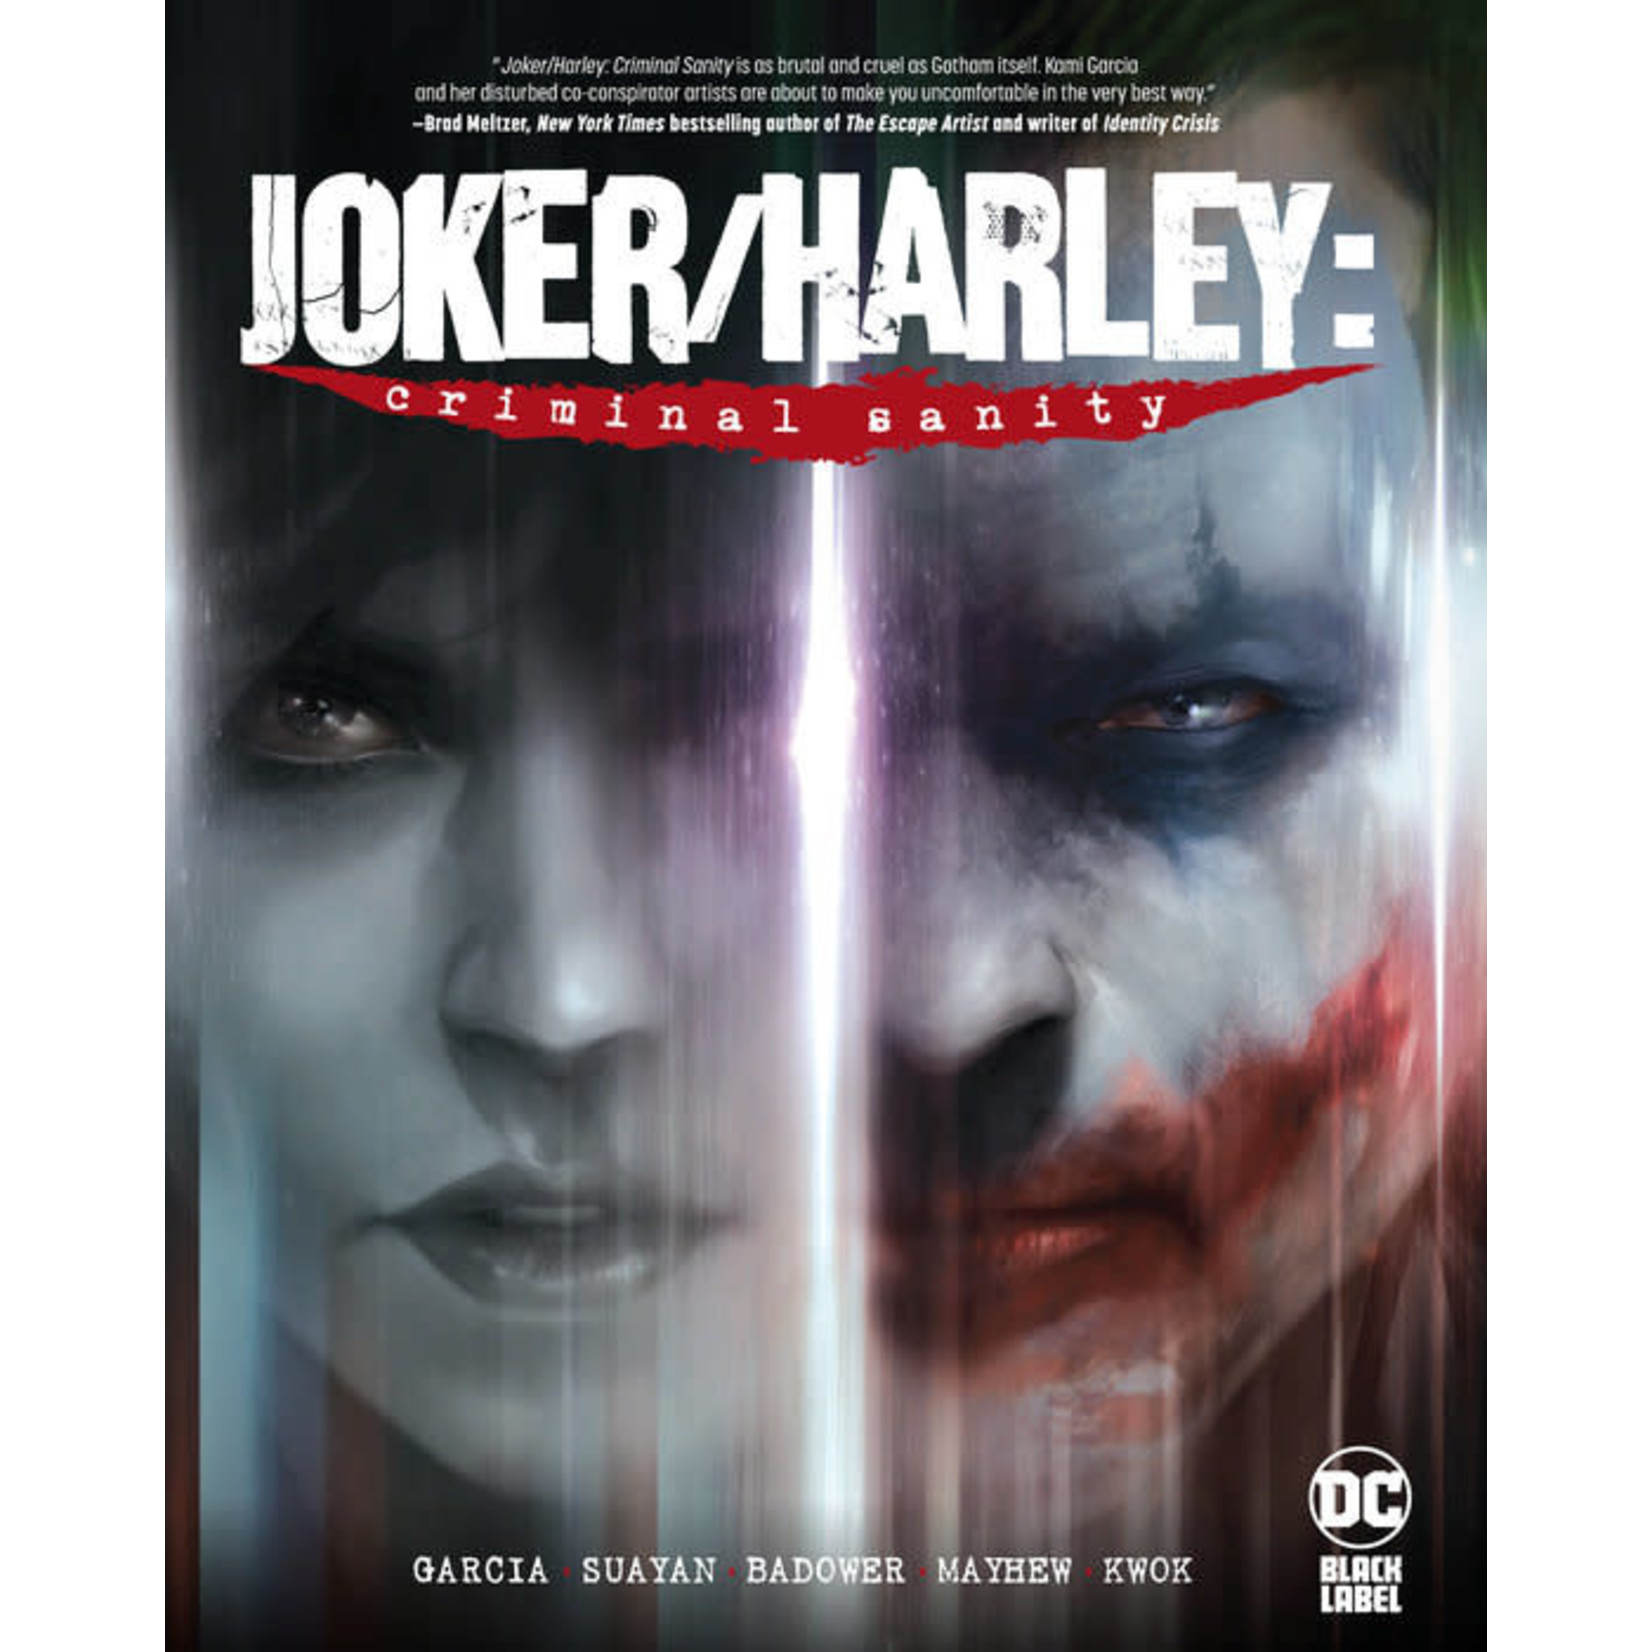 DC Comics Joker/Harley: Criminal Sanity